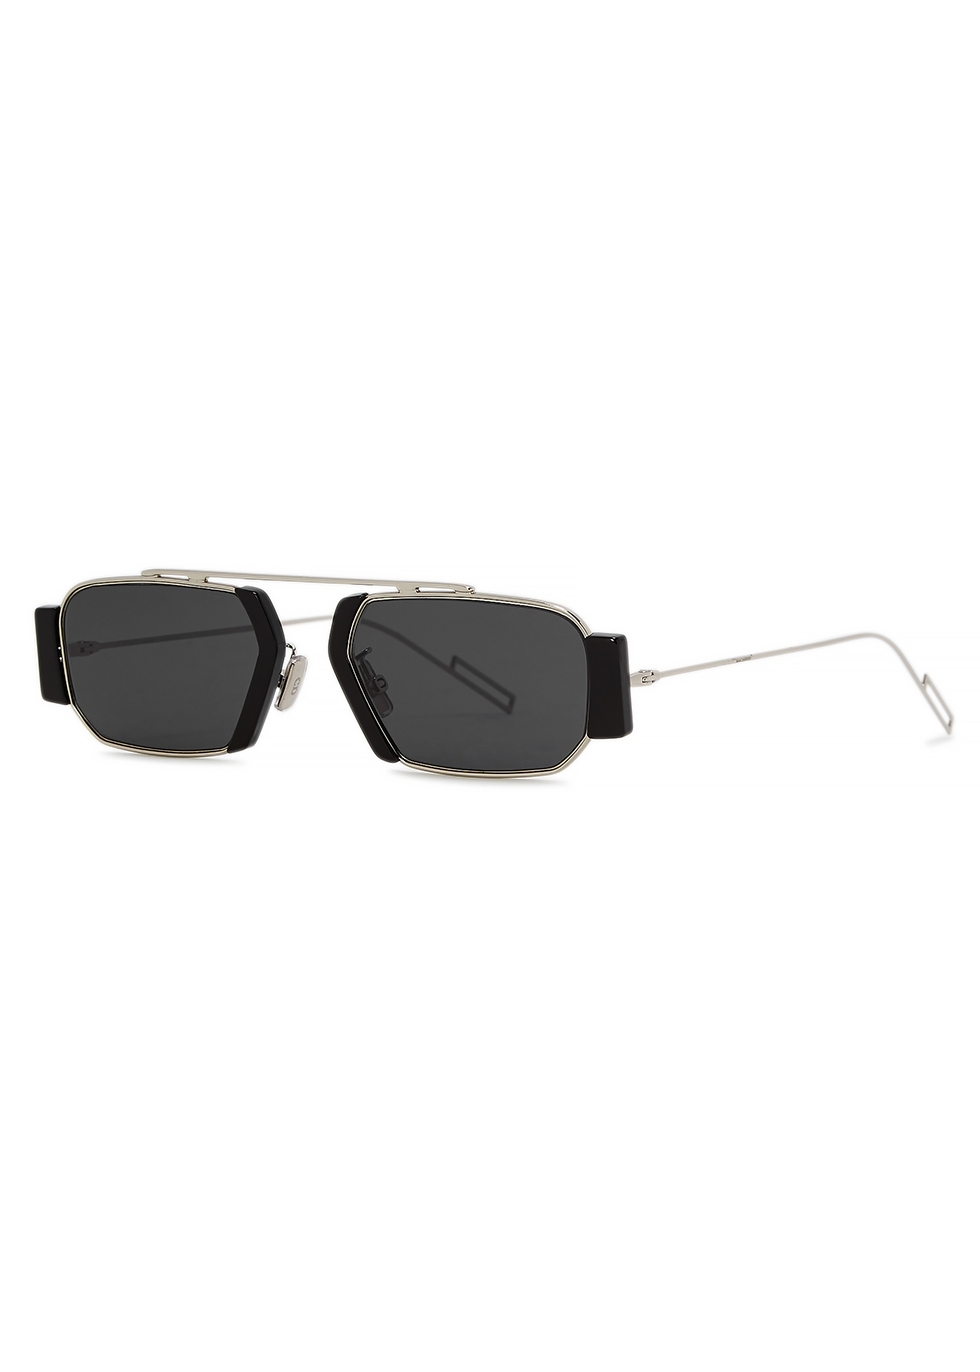 381cdec435 Men s Designer Sunglasses   Eyewear - Harvey Nichols